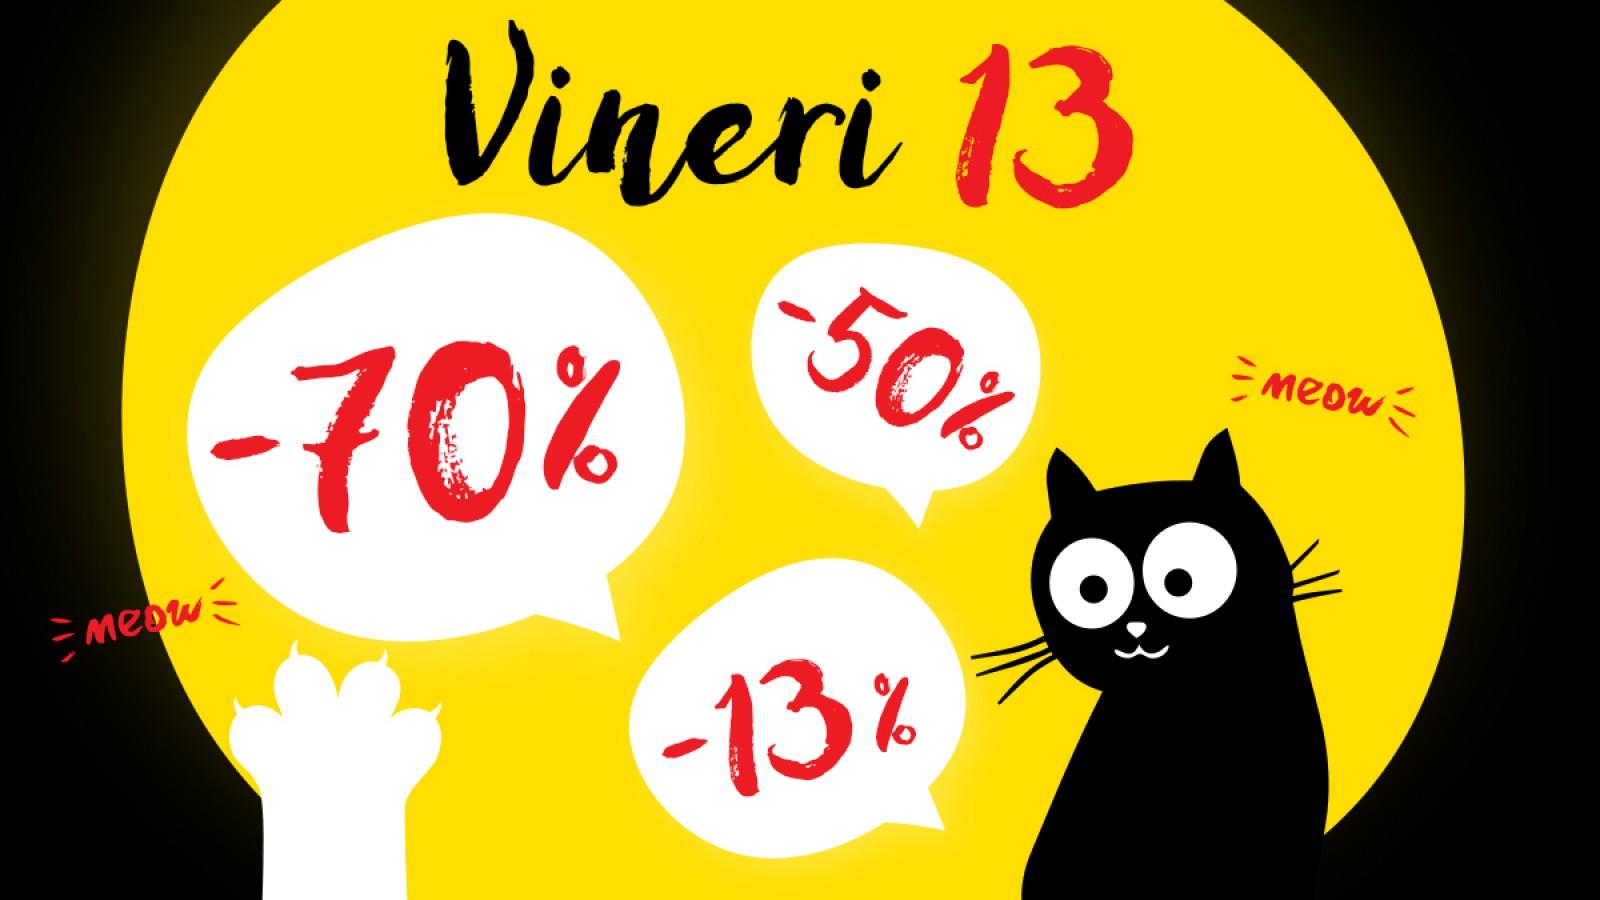 Astăzi este Ziua Ta Norocoasa la Top Shop. Reduceri de la -13% pana la -70% la toate produsele